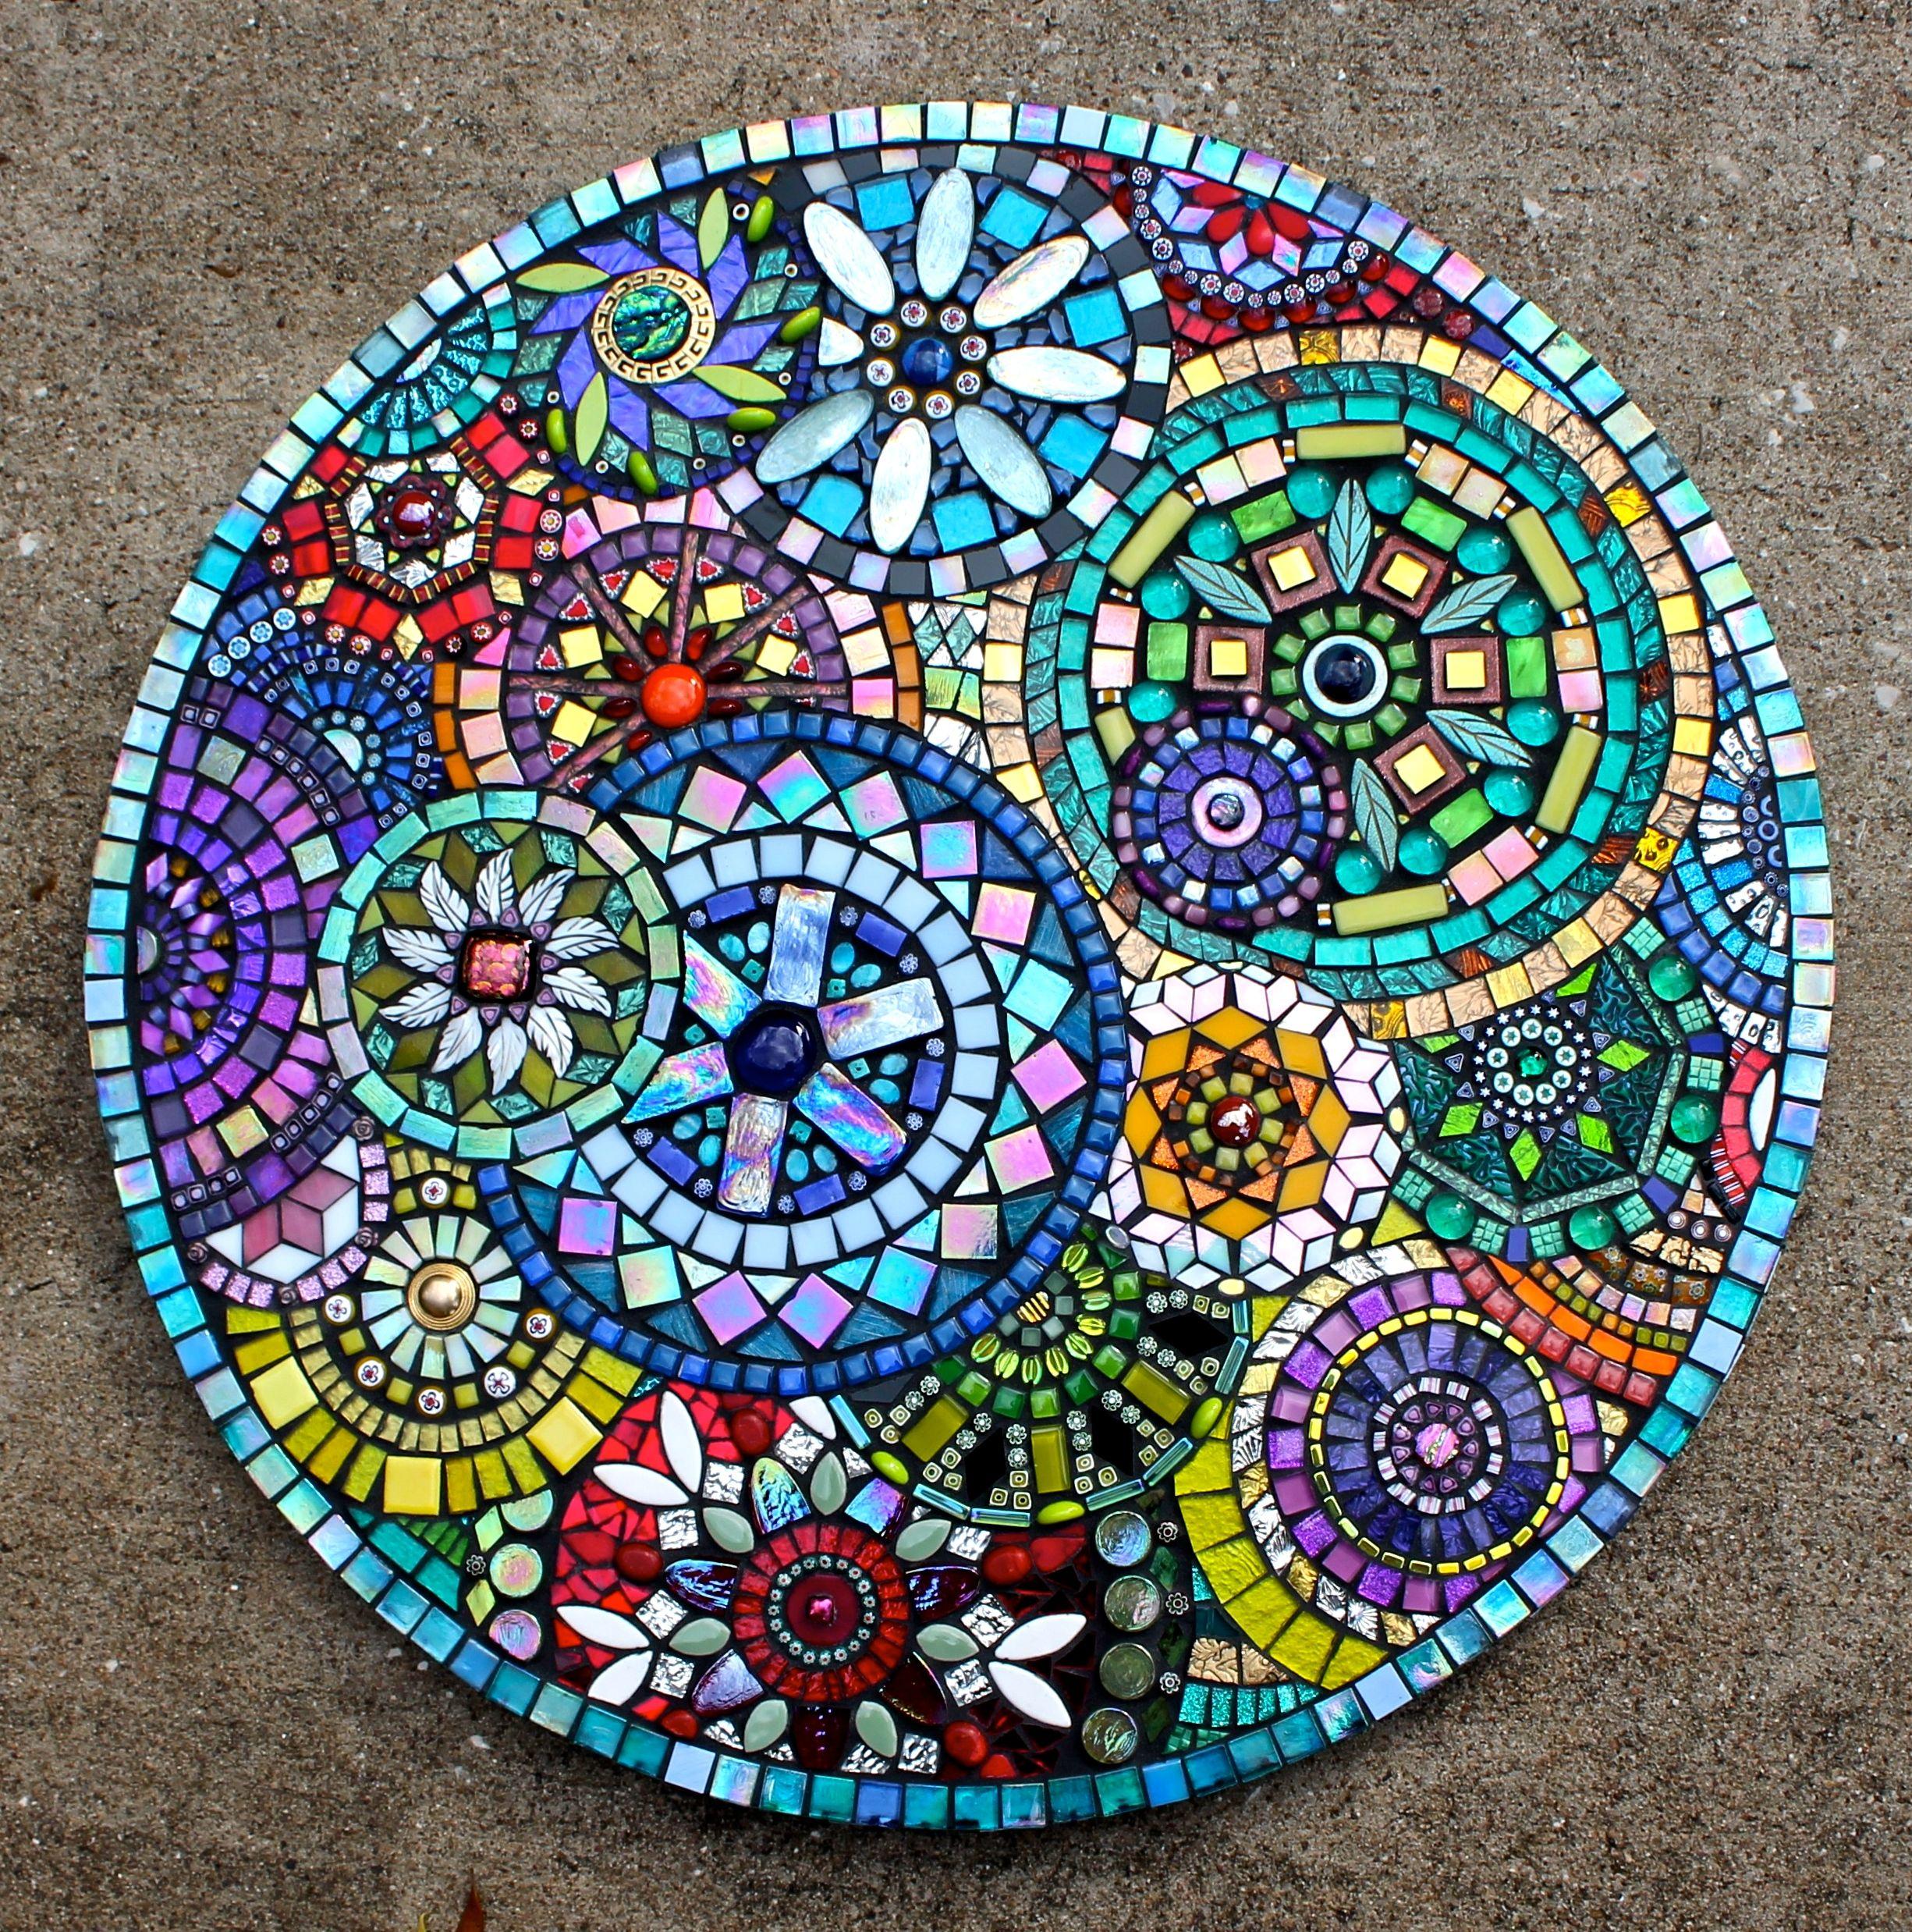 Mosaic by plum art mosaics 2014 sharon plummer mosaics for Easy mosaic designs